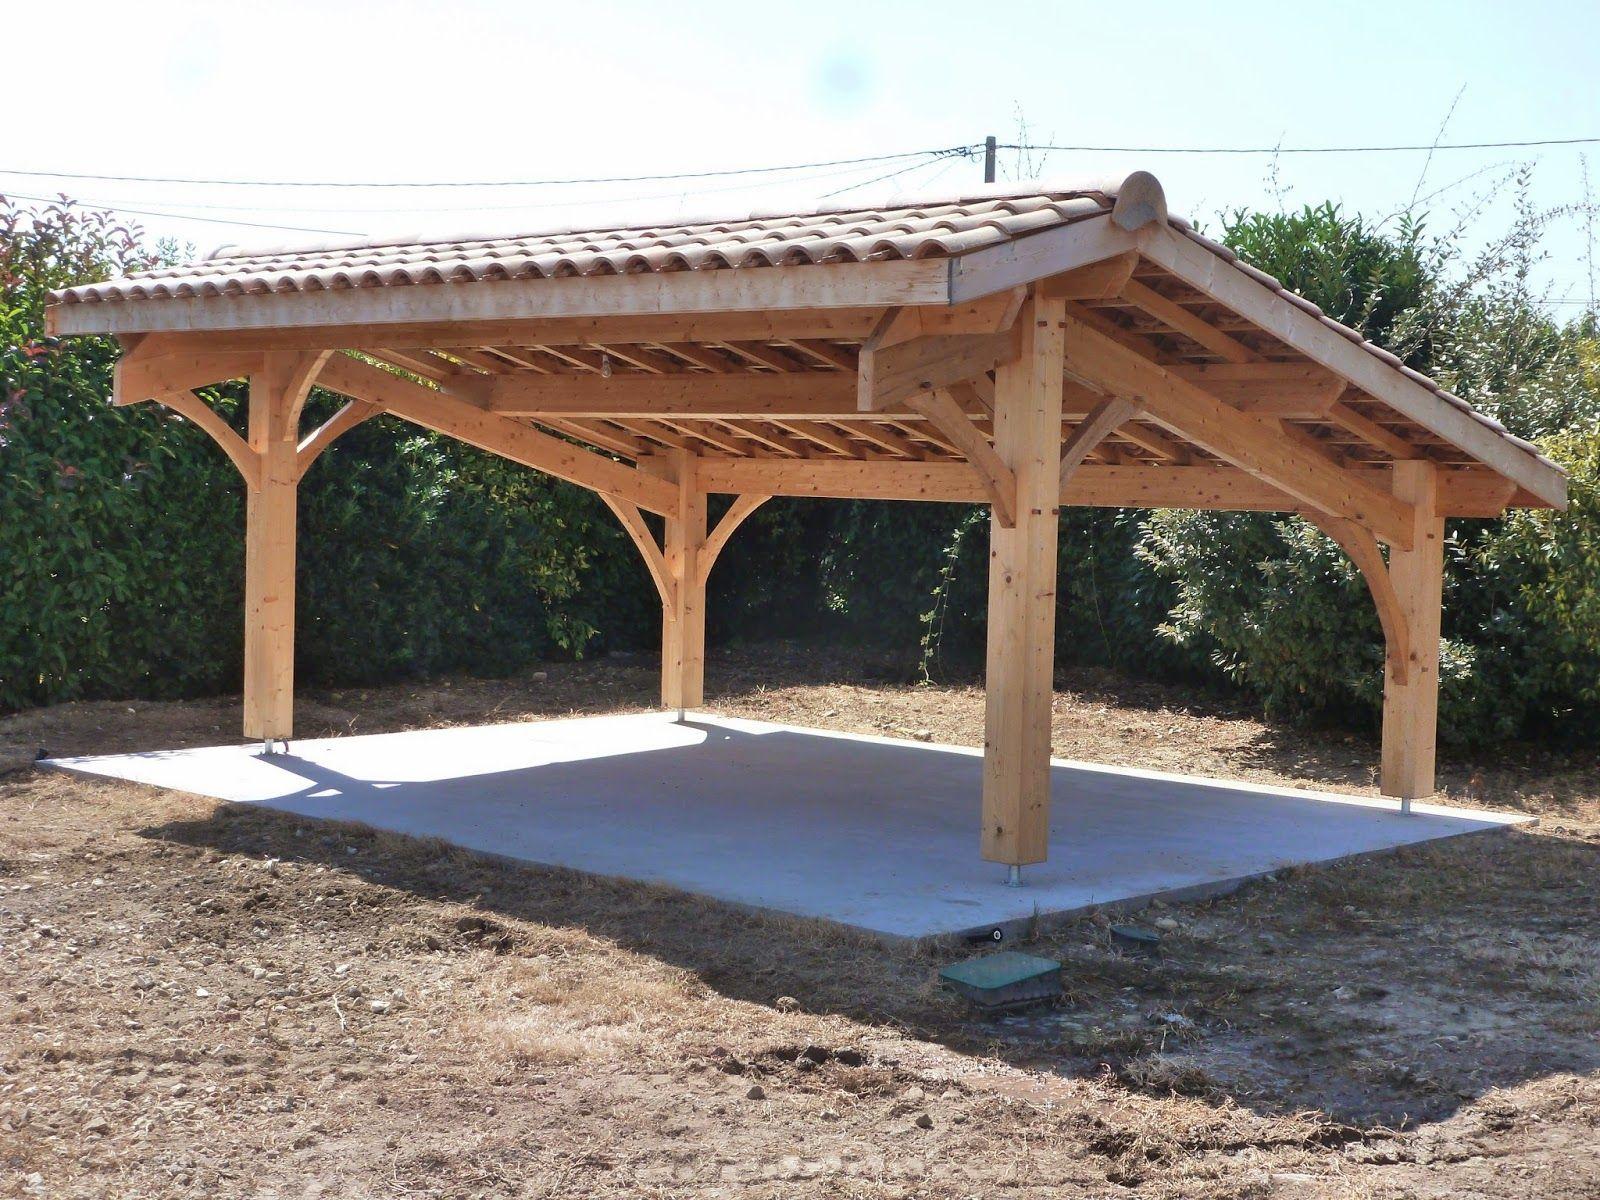 Abris De Jardin Bois / Carport Voitures Bois / Garage Bois ... à Appenti De Jardin